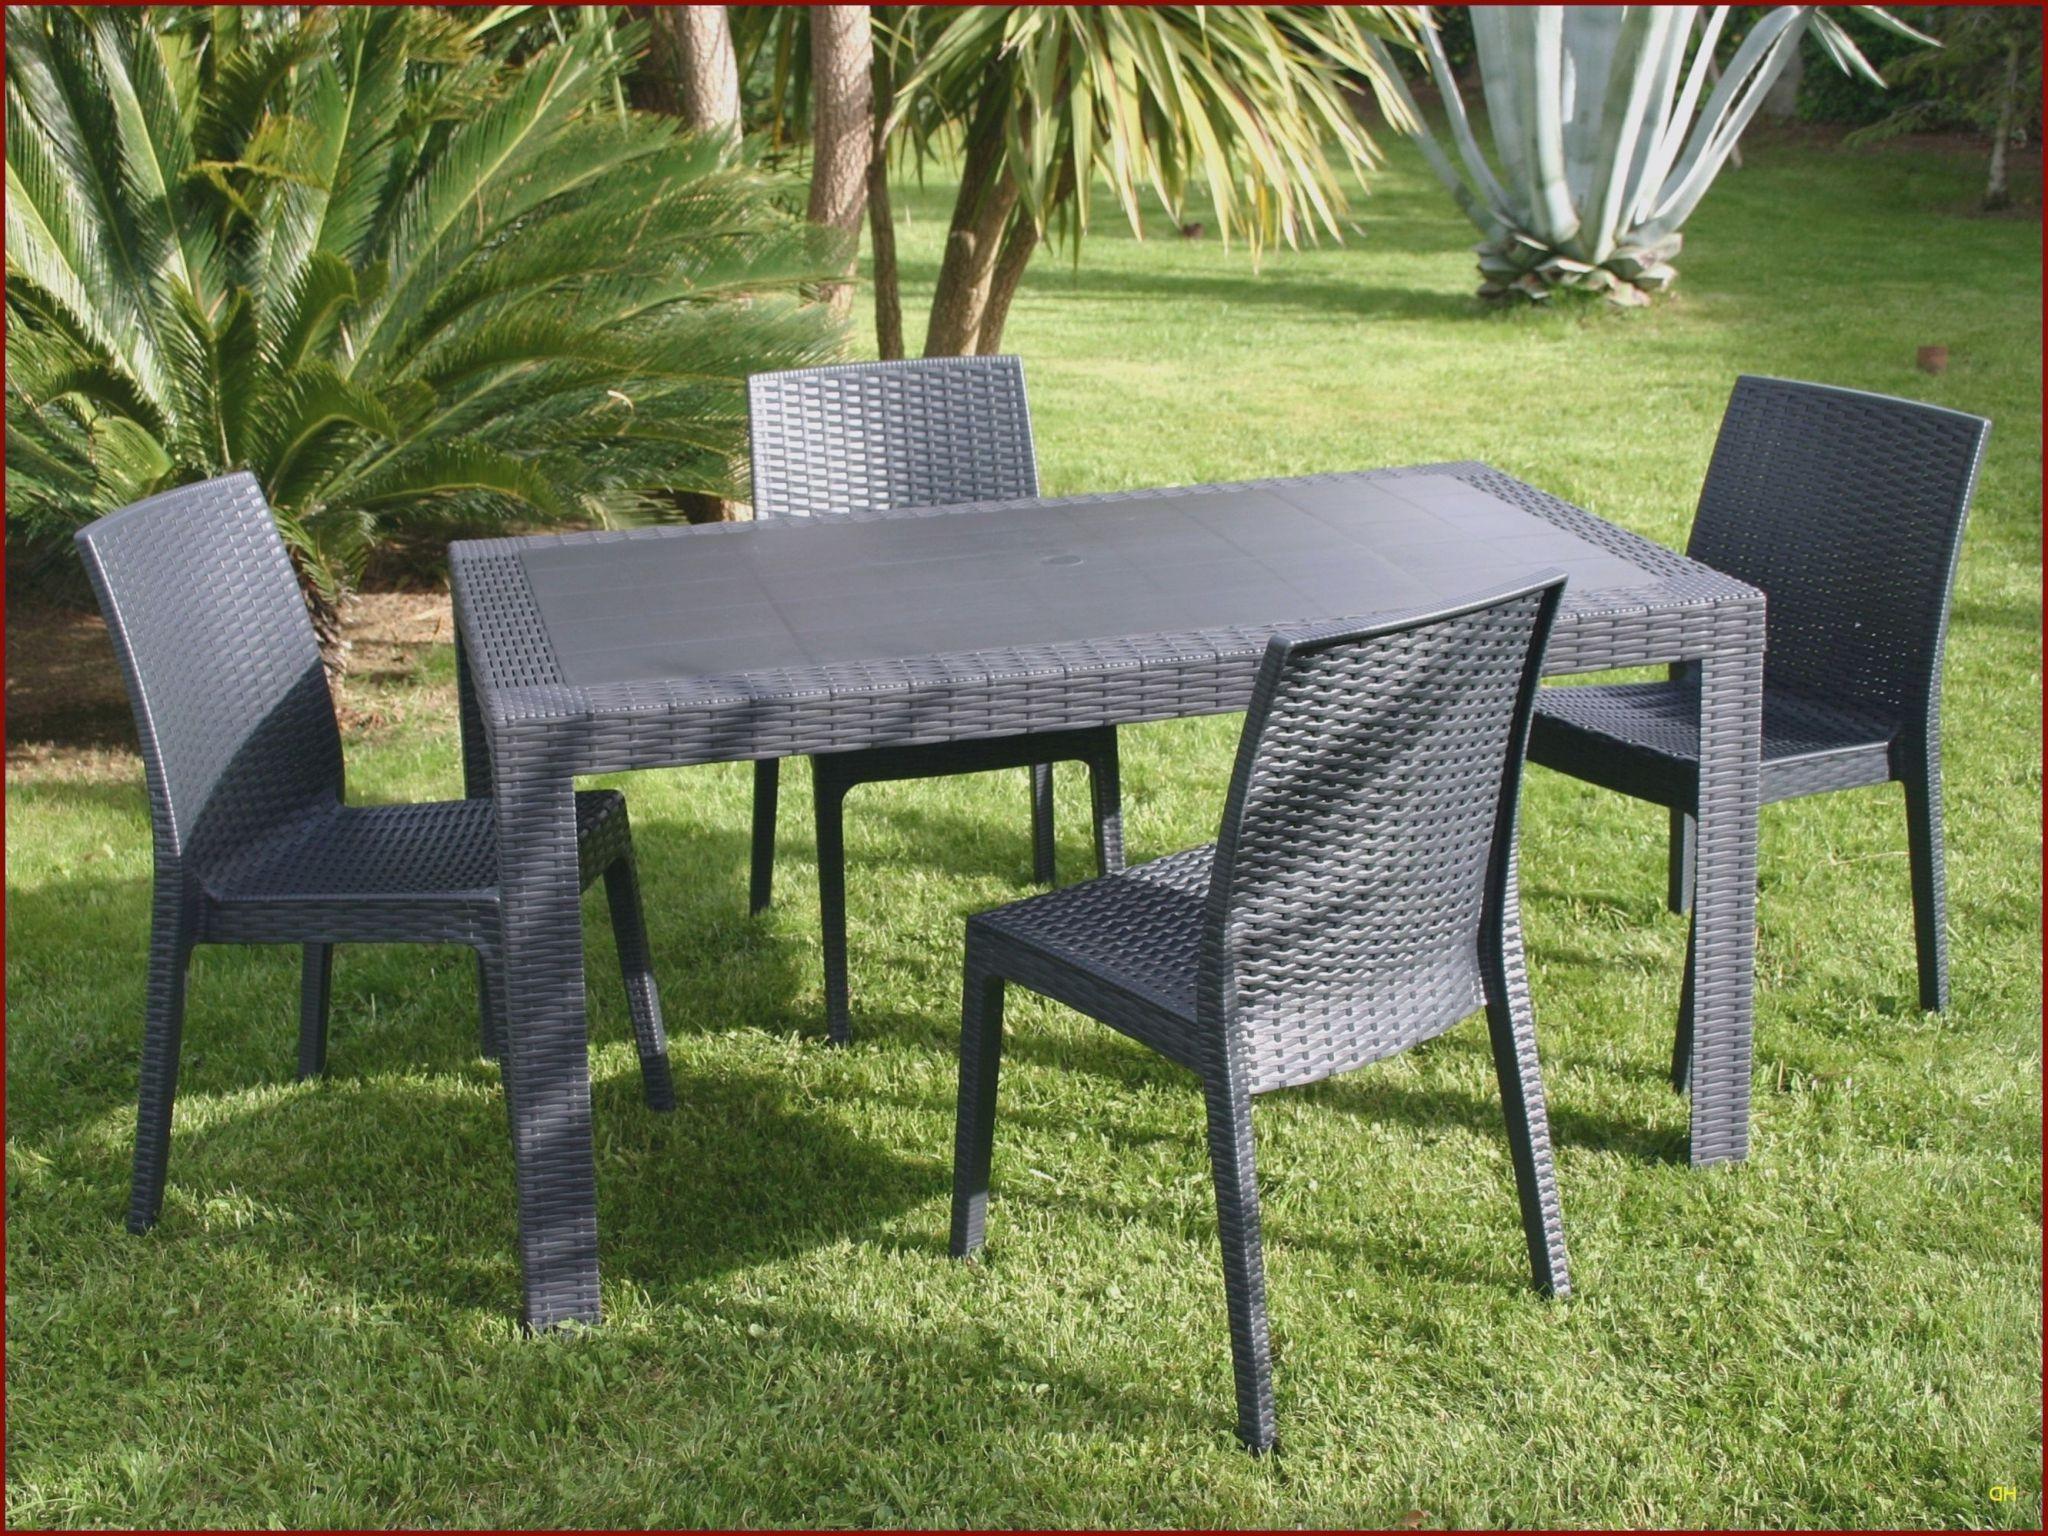 salon de jardin resine leclerc inspirational chaises luxe chaise ice 0d table jardin resine lovely of salon de jardin resine leclerc